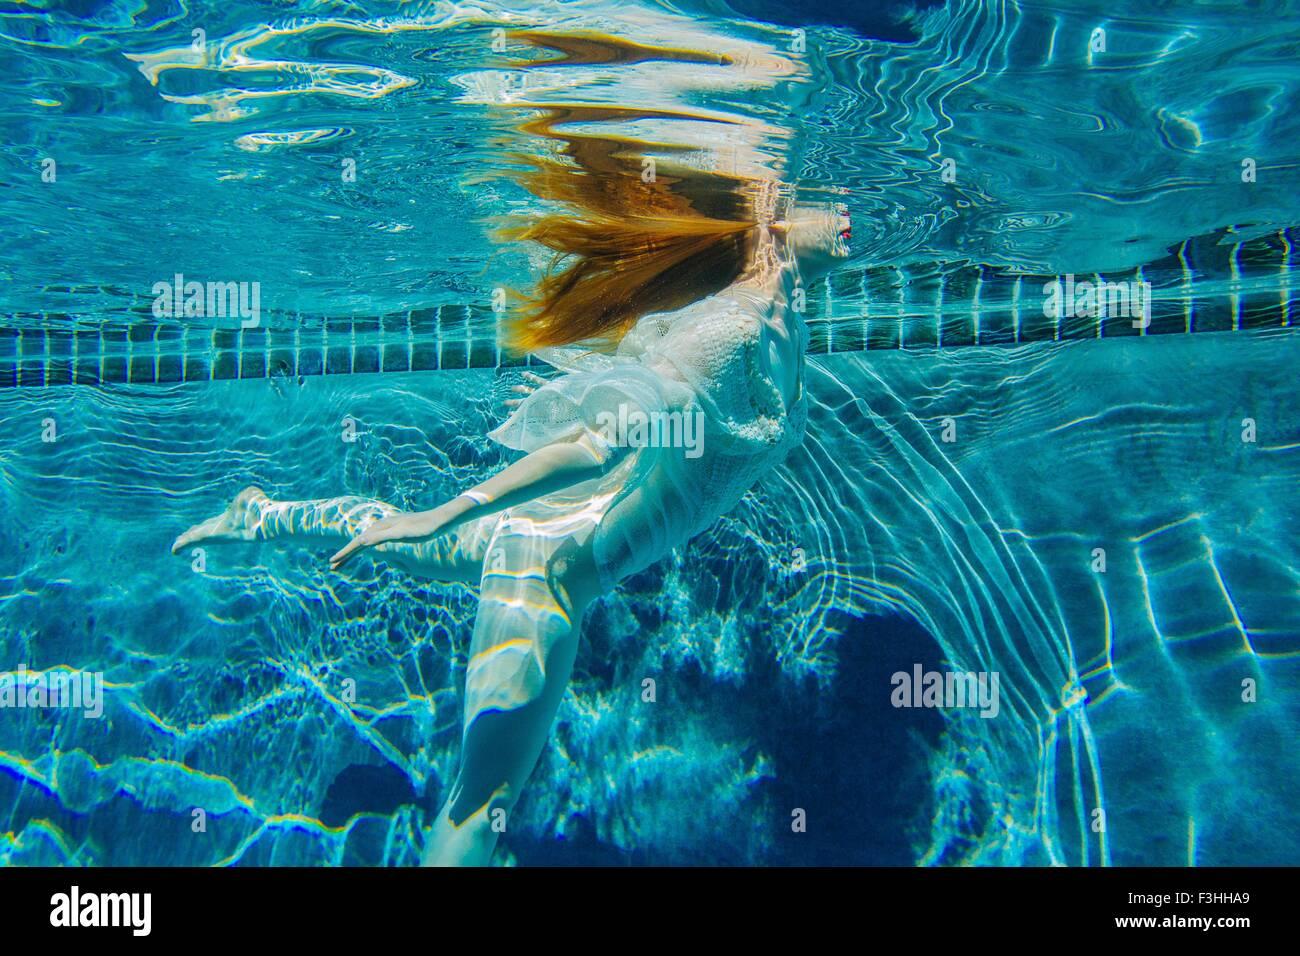 Young woman underwater, wearing thin white shirt - Stock